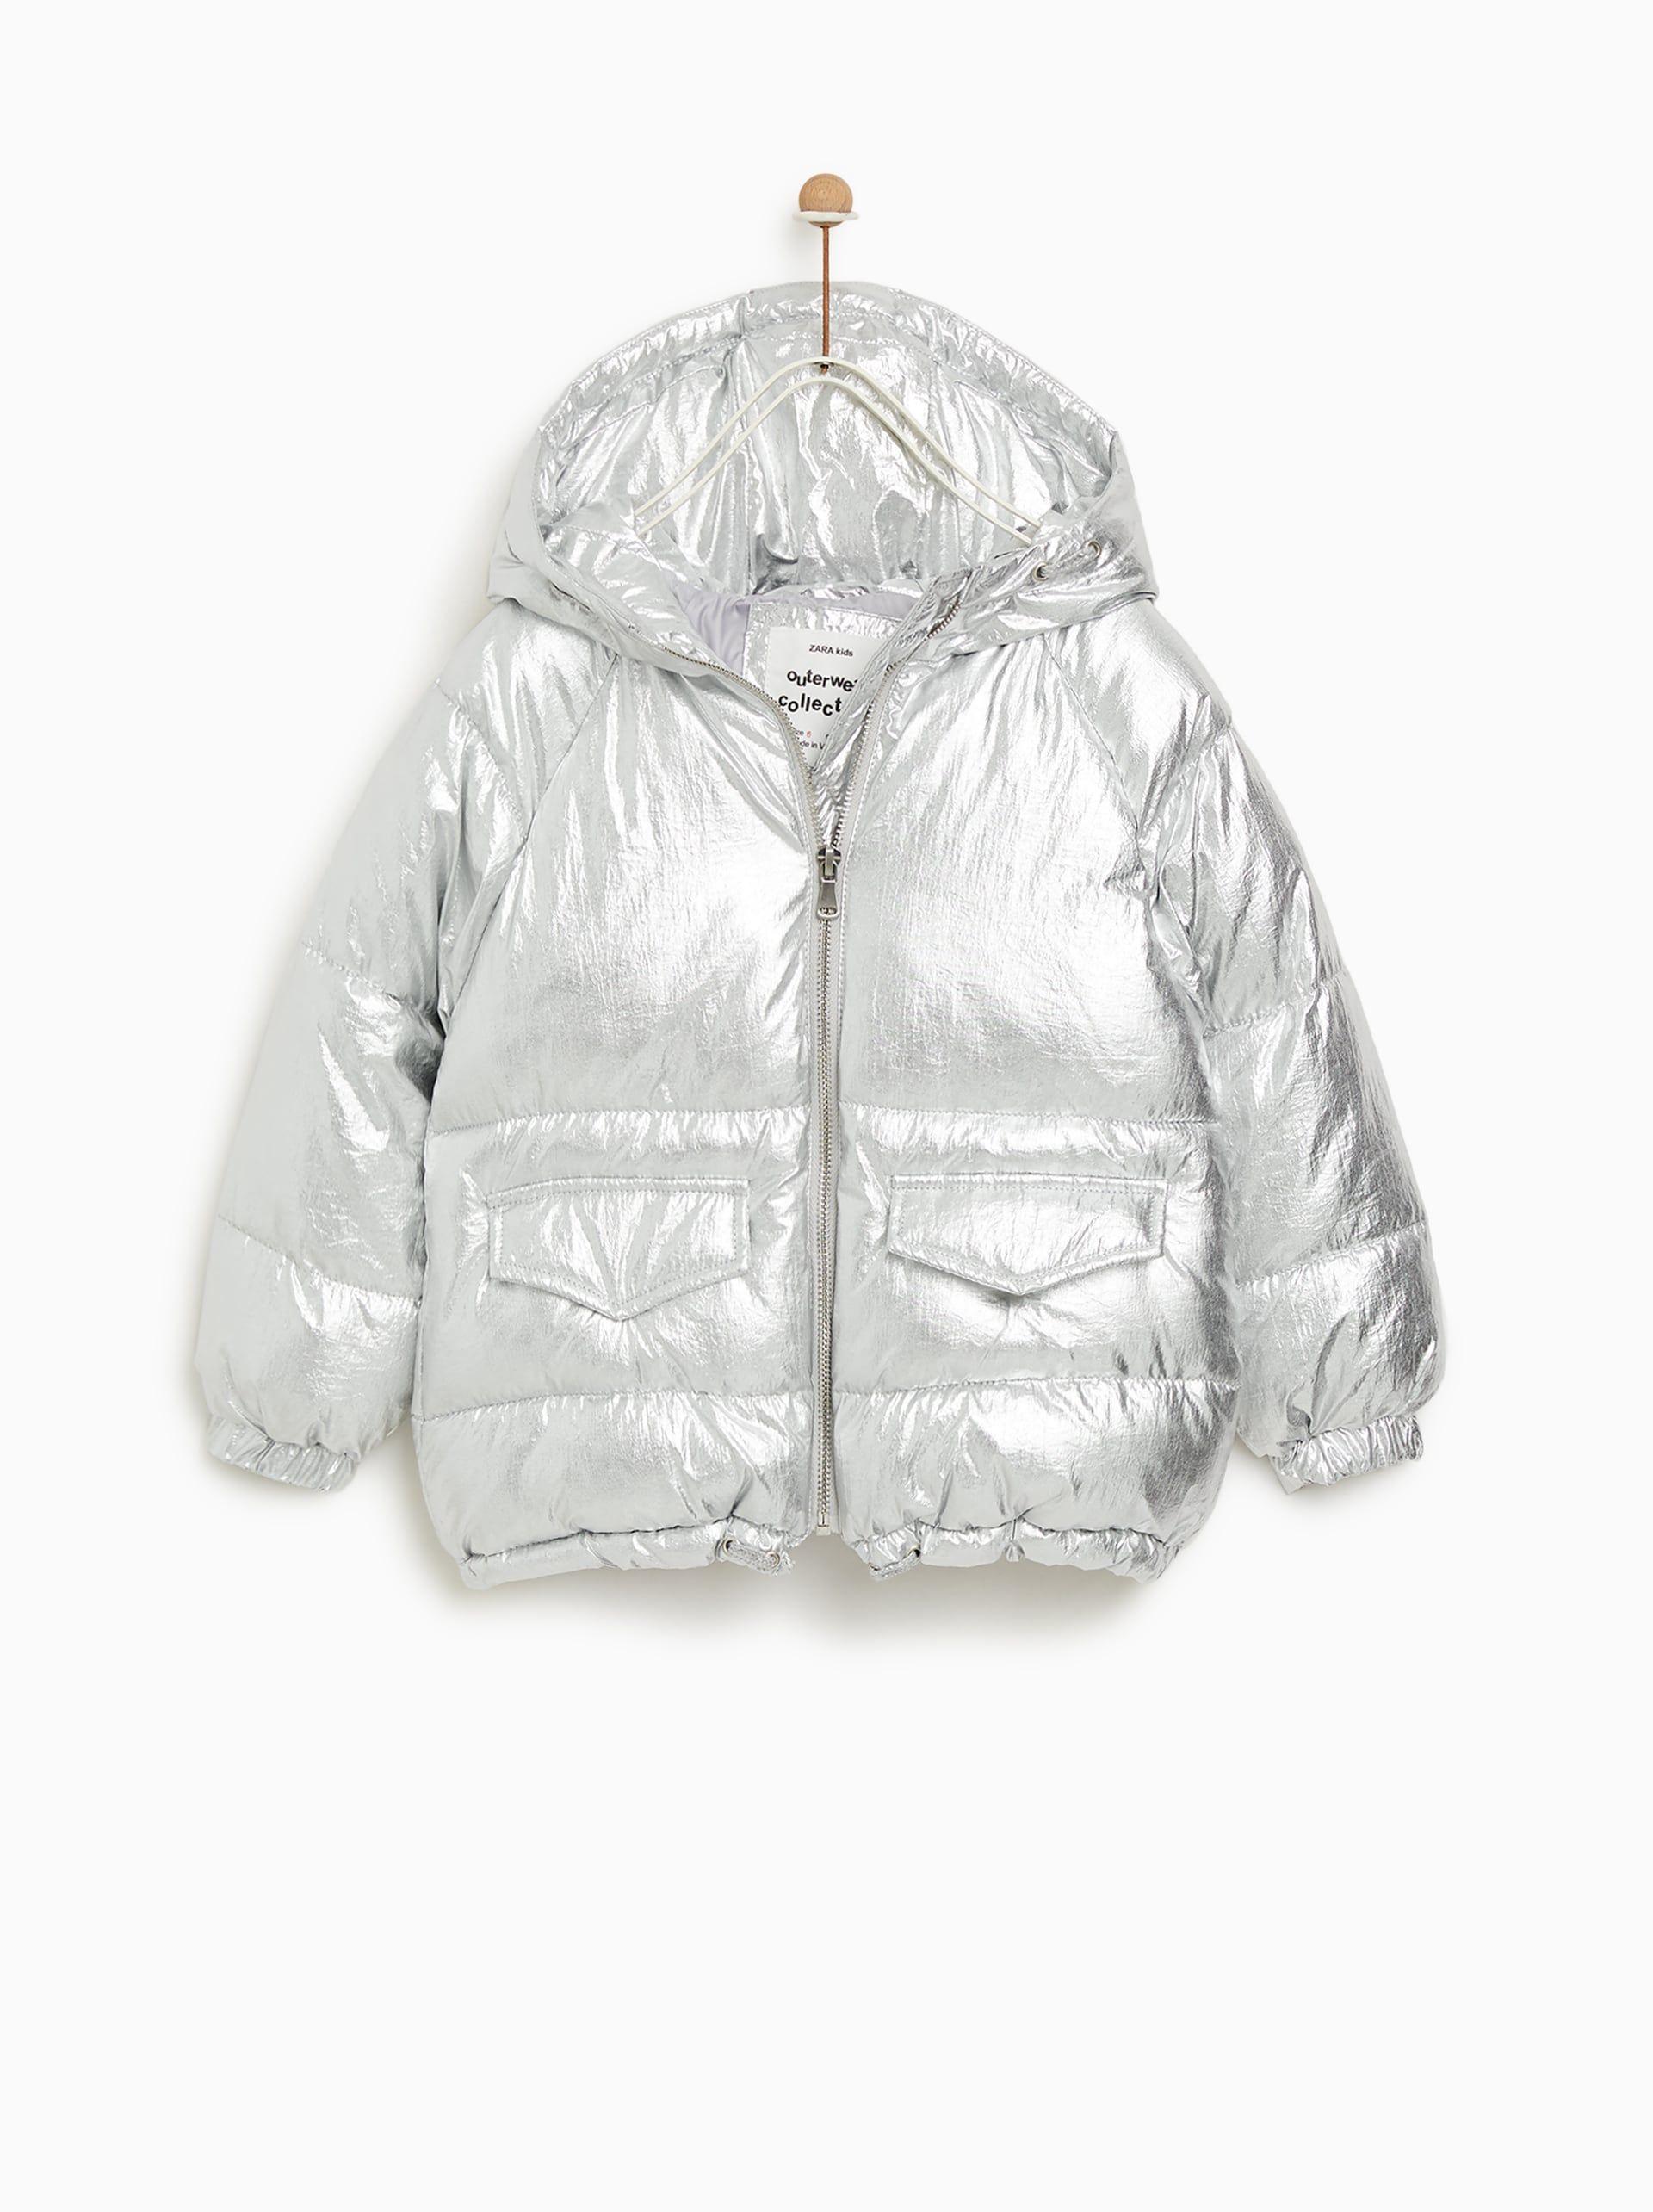 ZARA - ΠΑΙΔΙΚΑ - ΜΠΟΥΦΑΝ ΚΑΠΙΤΟΝΕ ΜΕΤΑΛΛΙΖΕ Kids Winter Fashion 3dc370fa220